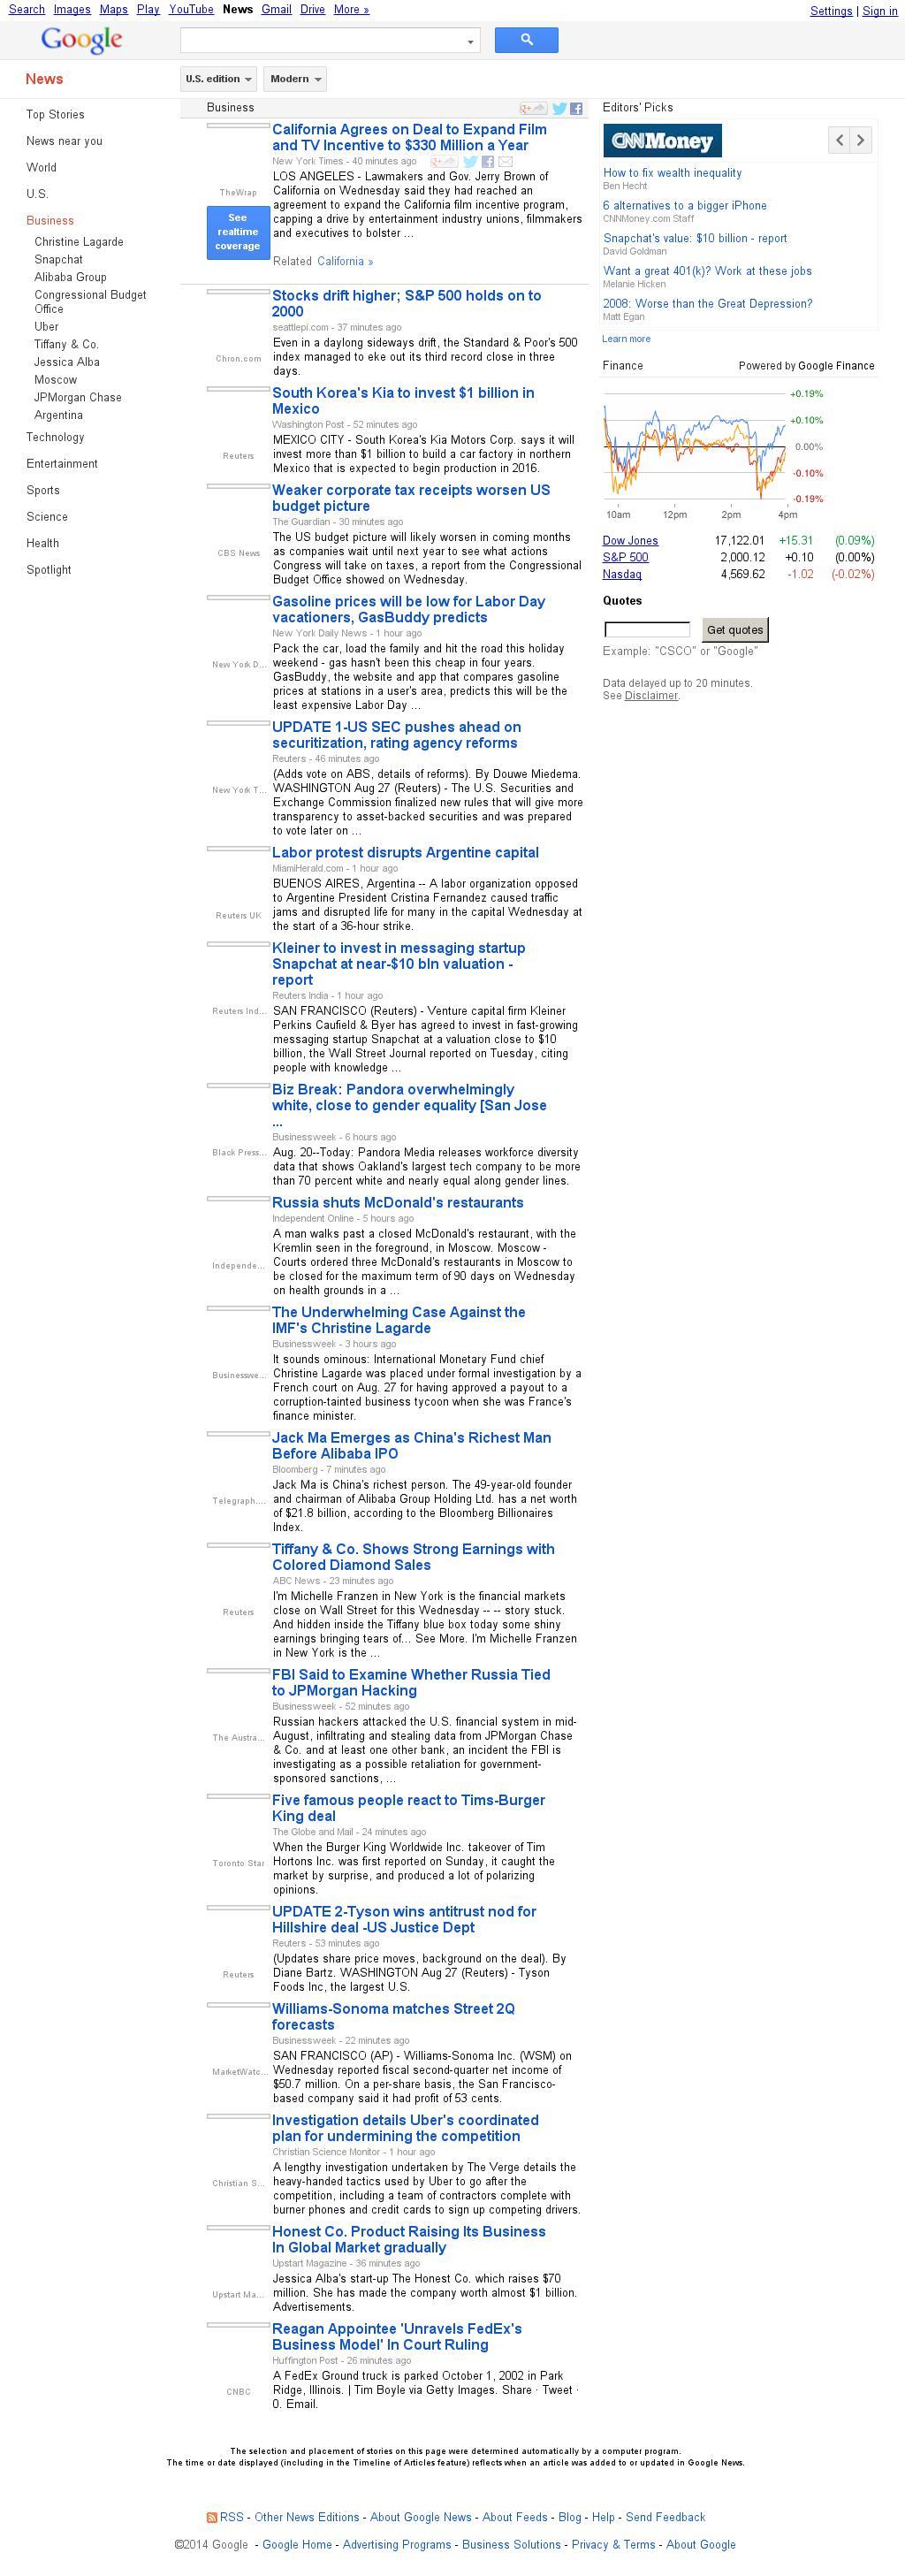 Google News: Business at Wednesday Aug. 27, 2014, 10:07 p.m. UTC